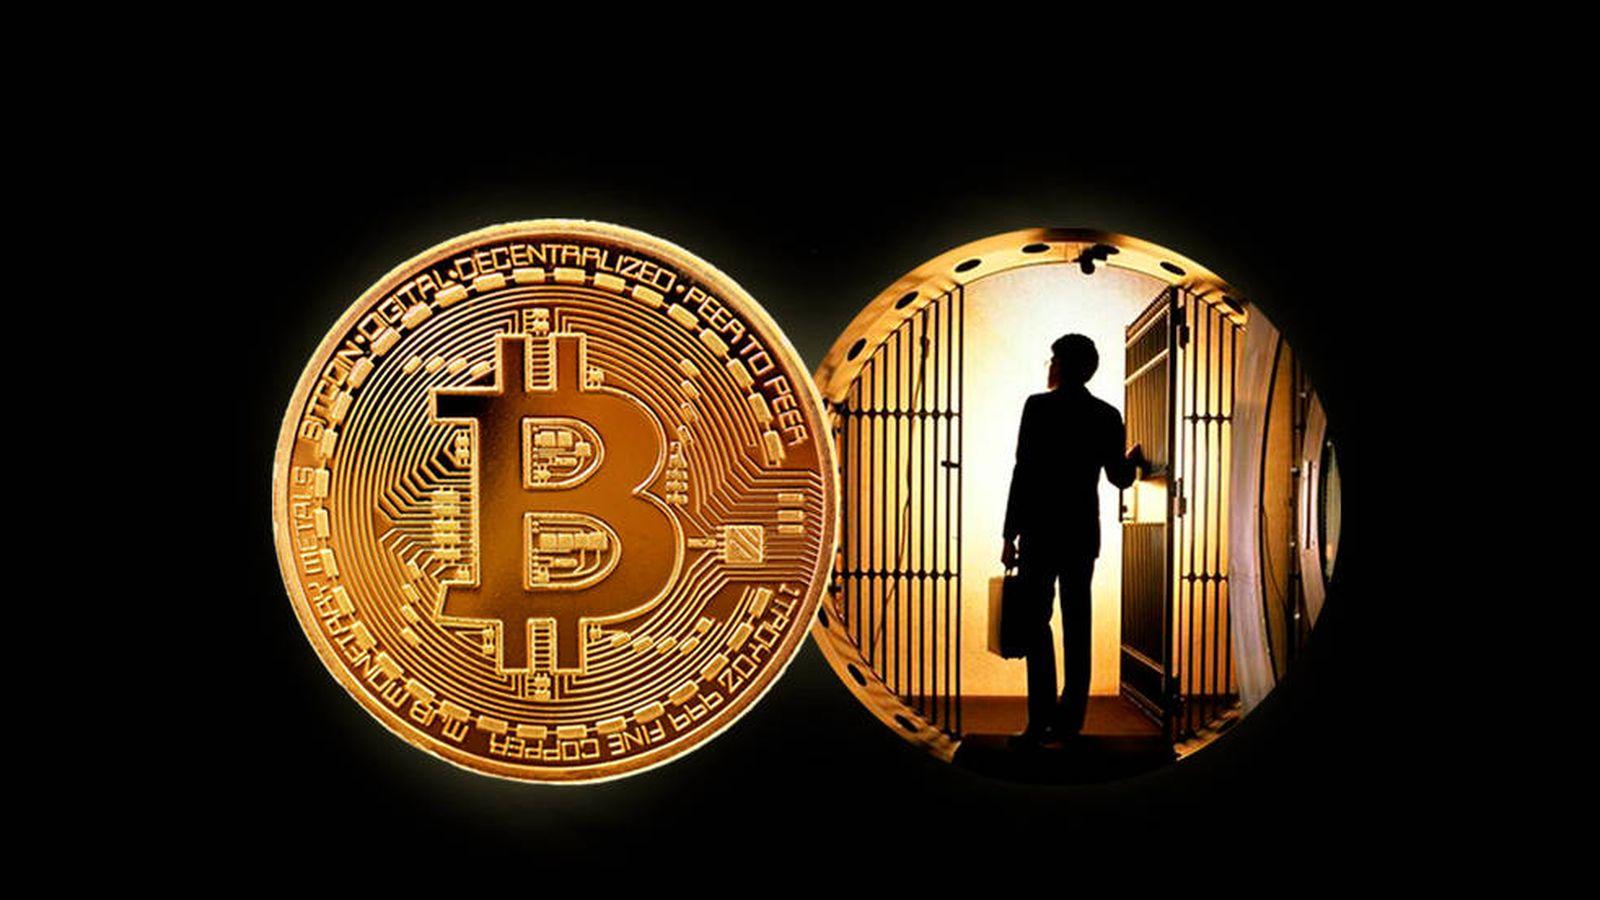 Blanqueo bitcoins bo dog betting